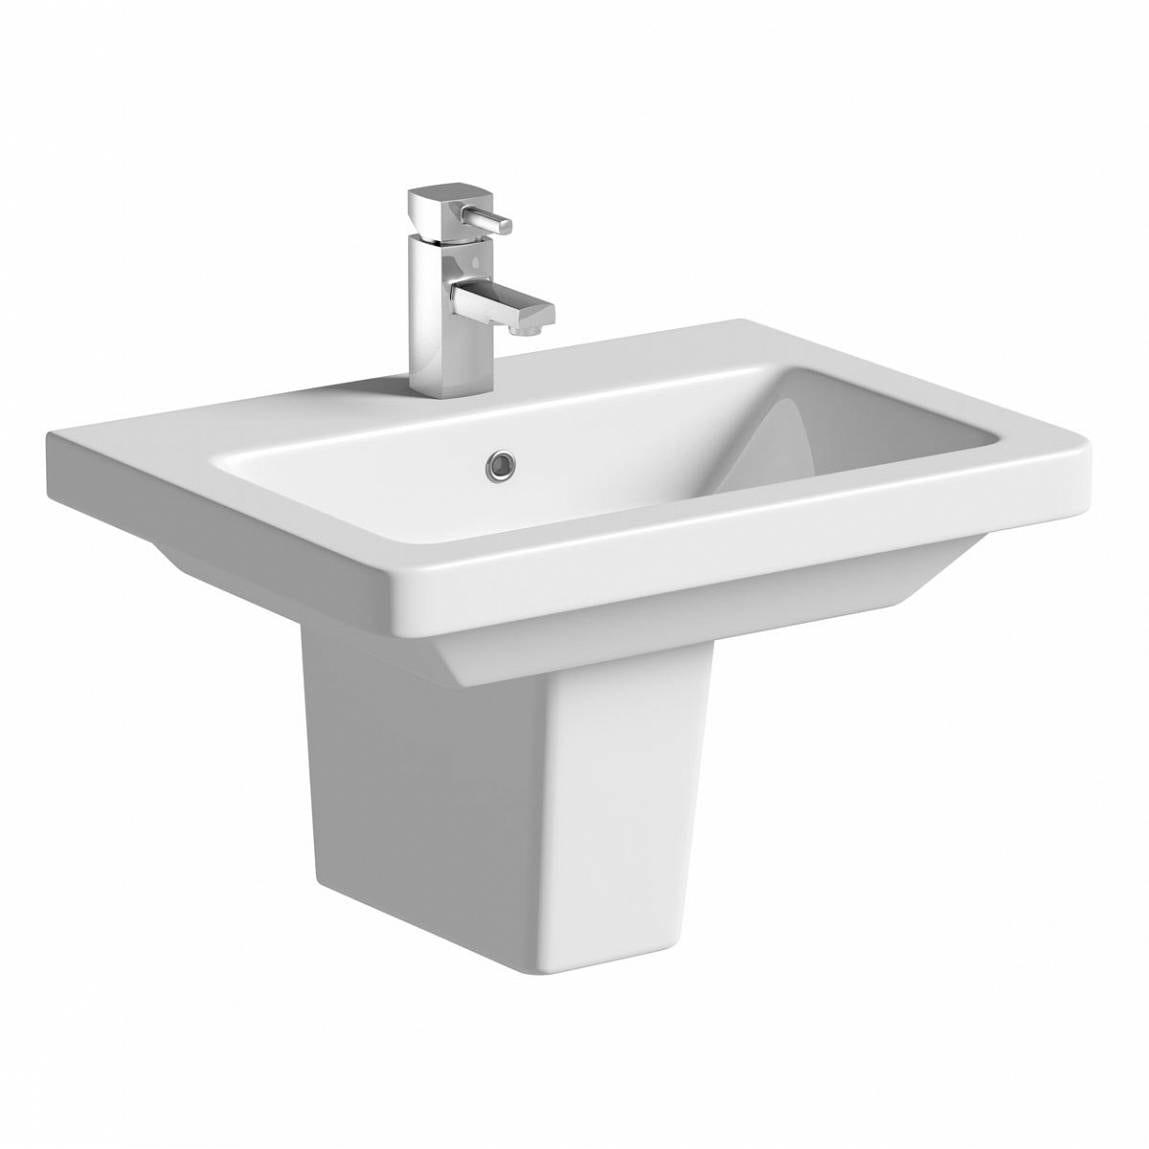 Verso 1TH 550mm Basin & Semi Pedestal